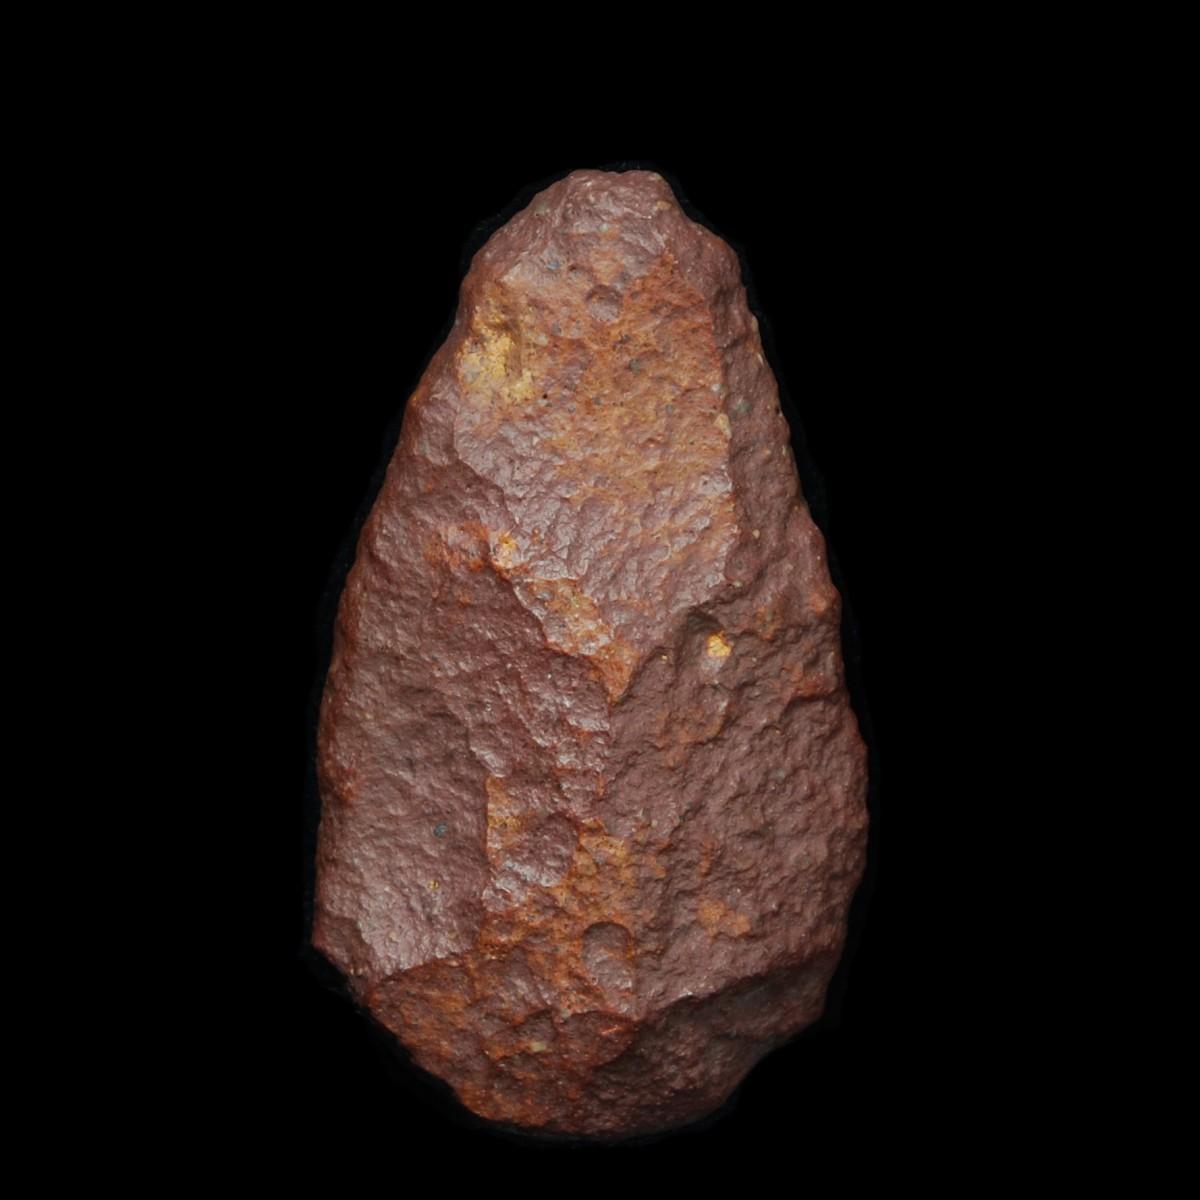 Hand axe 9 x 5 cm